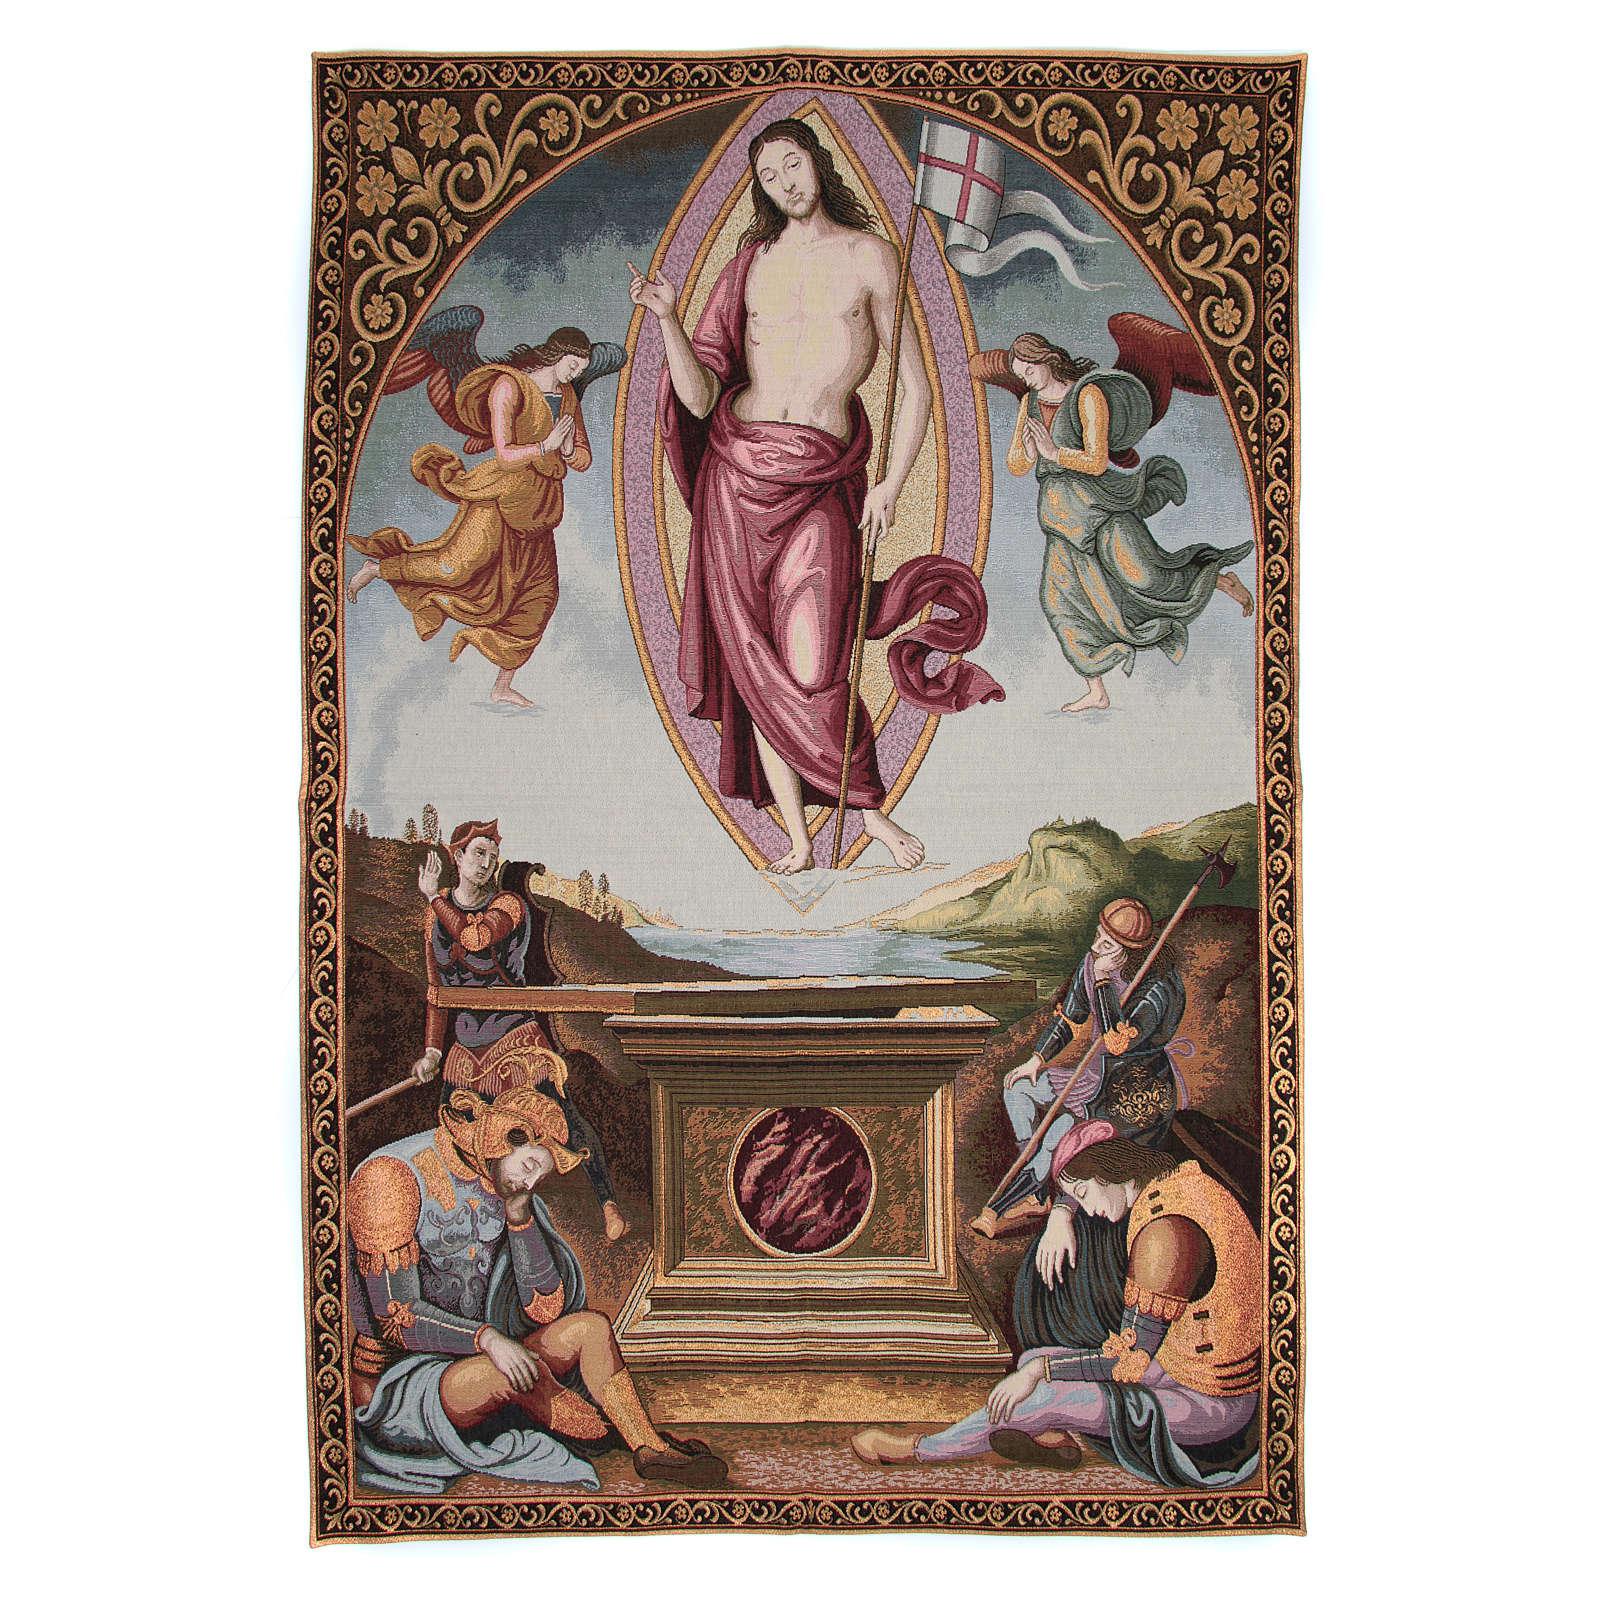 Tapiz Resurrección de Perugino 130 x 95 cm 3